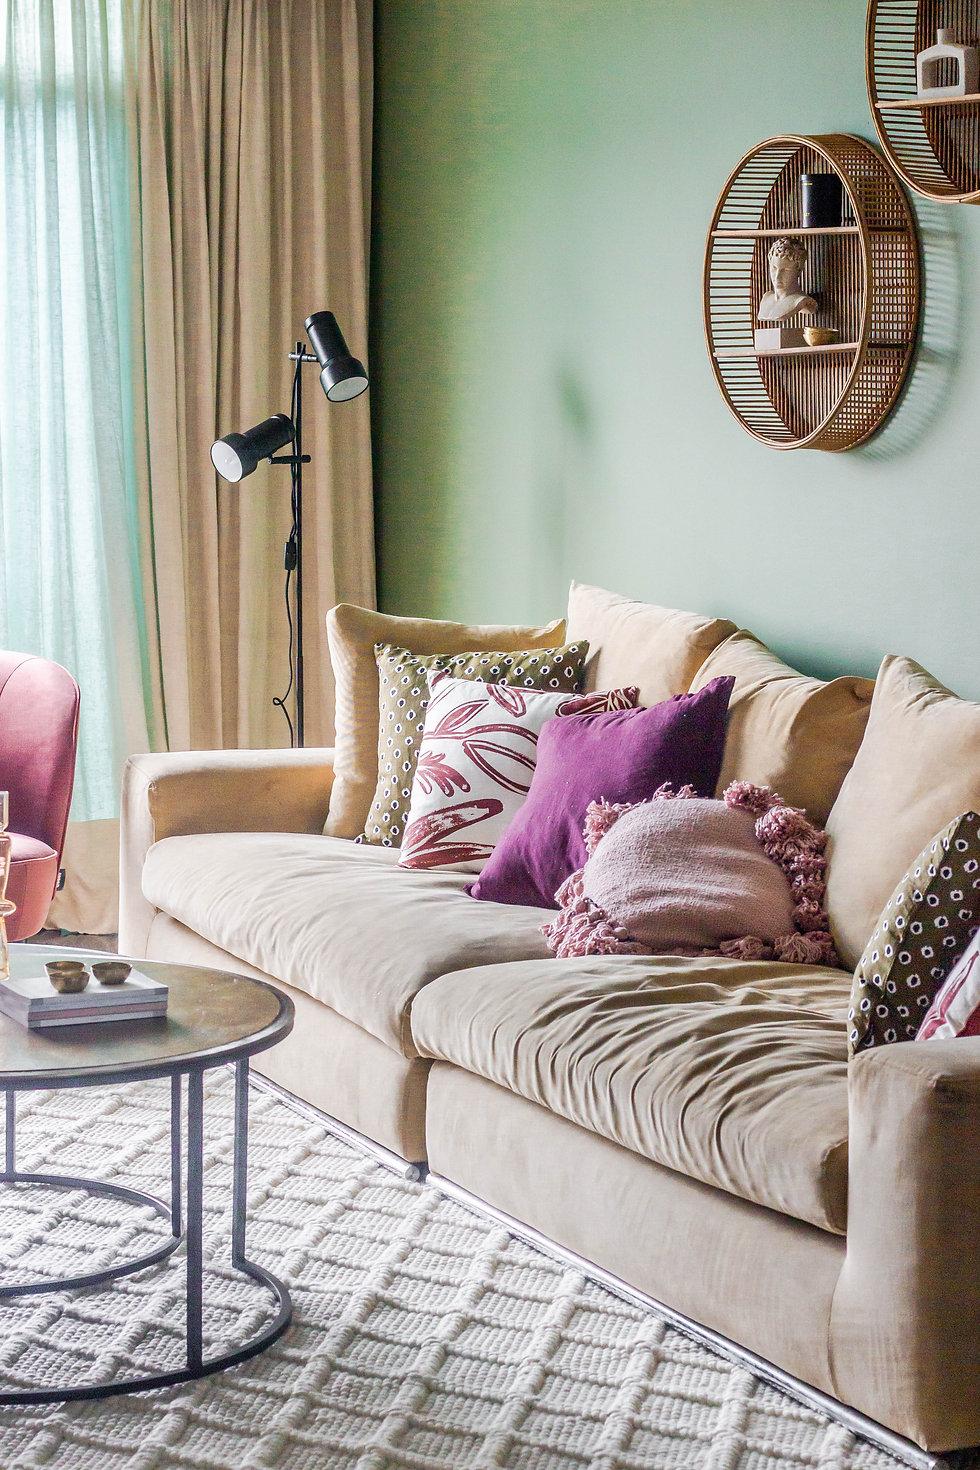 A Bold and Colourful Urban Apartment